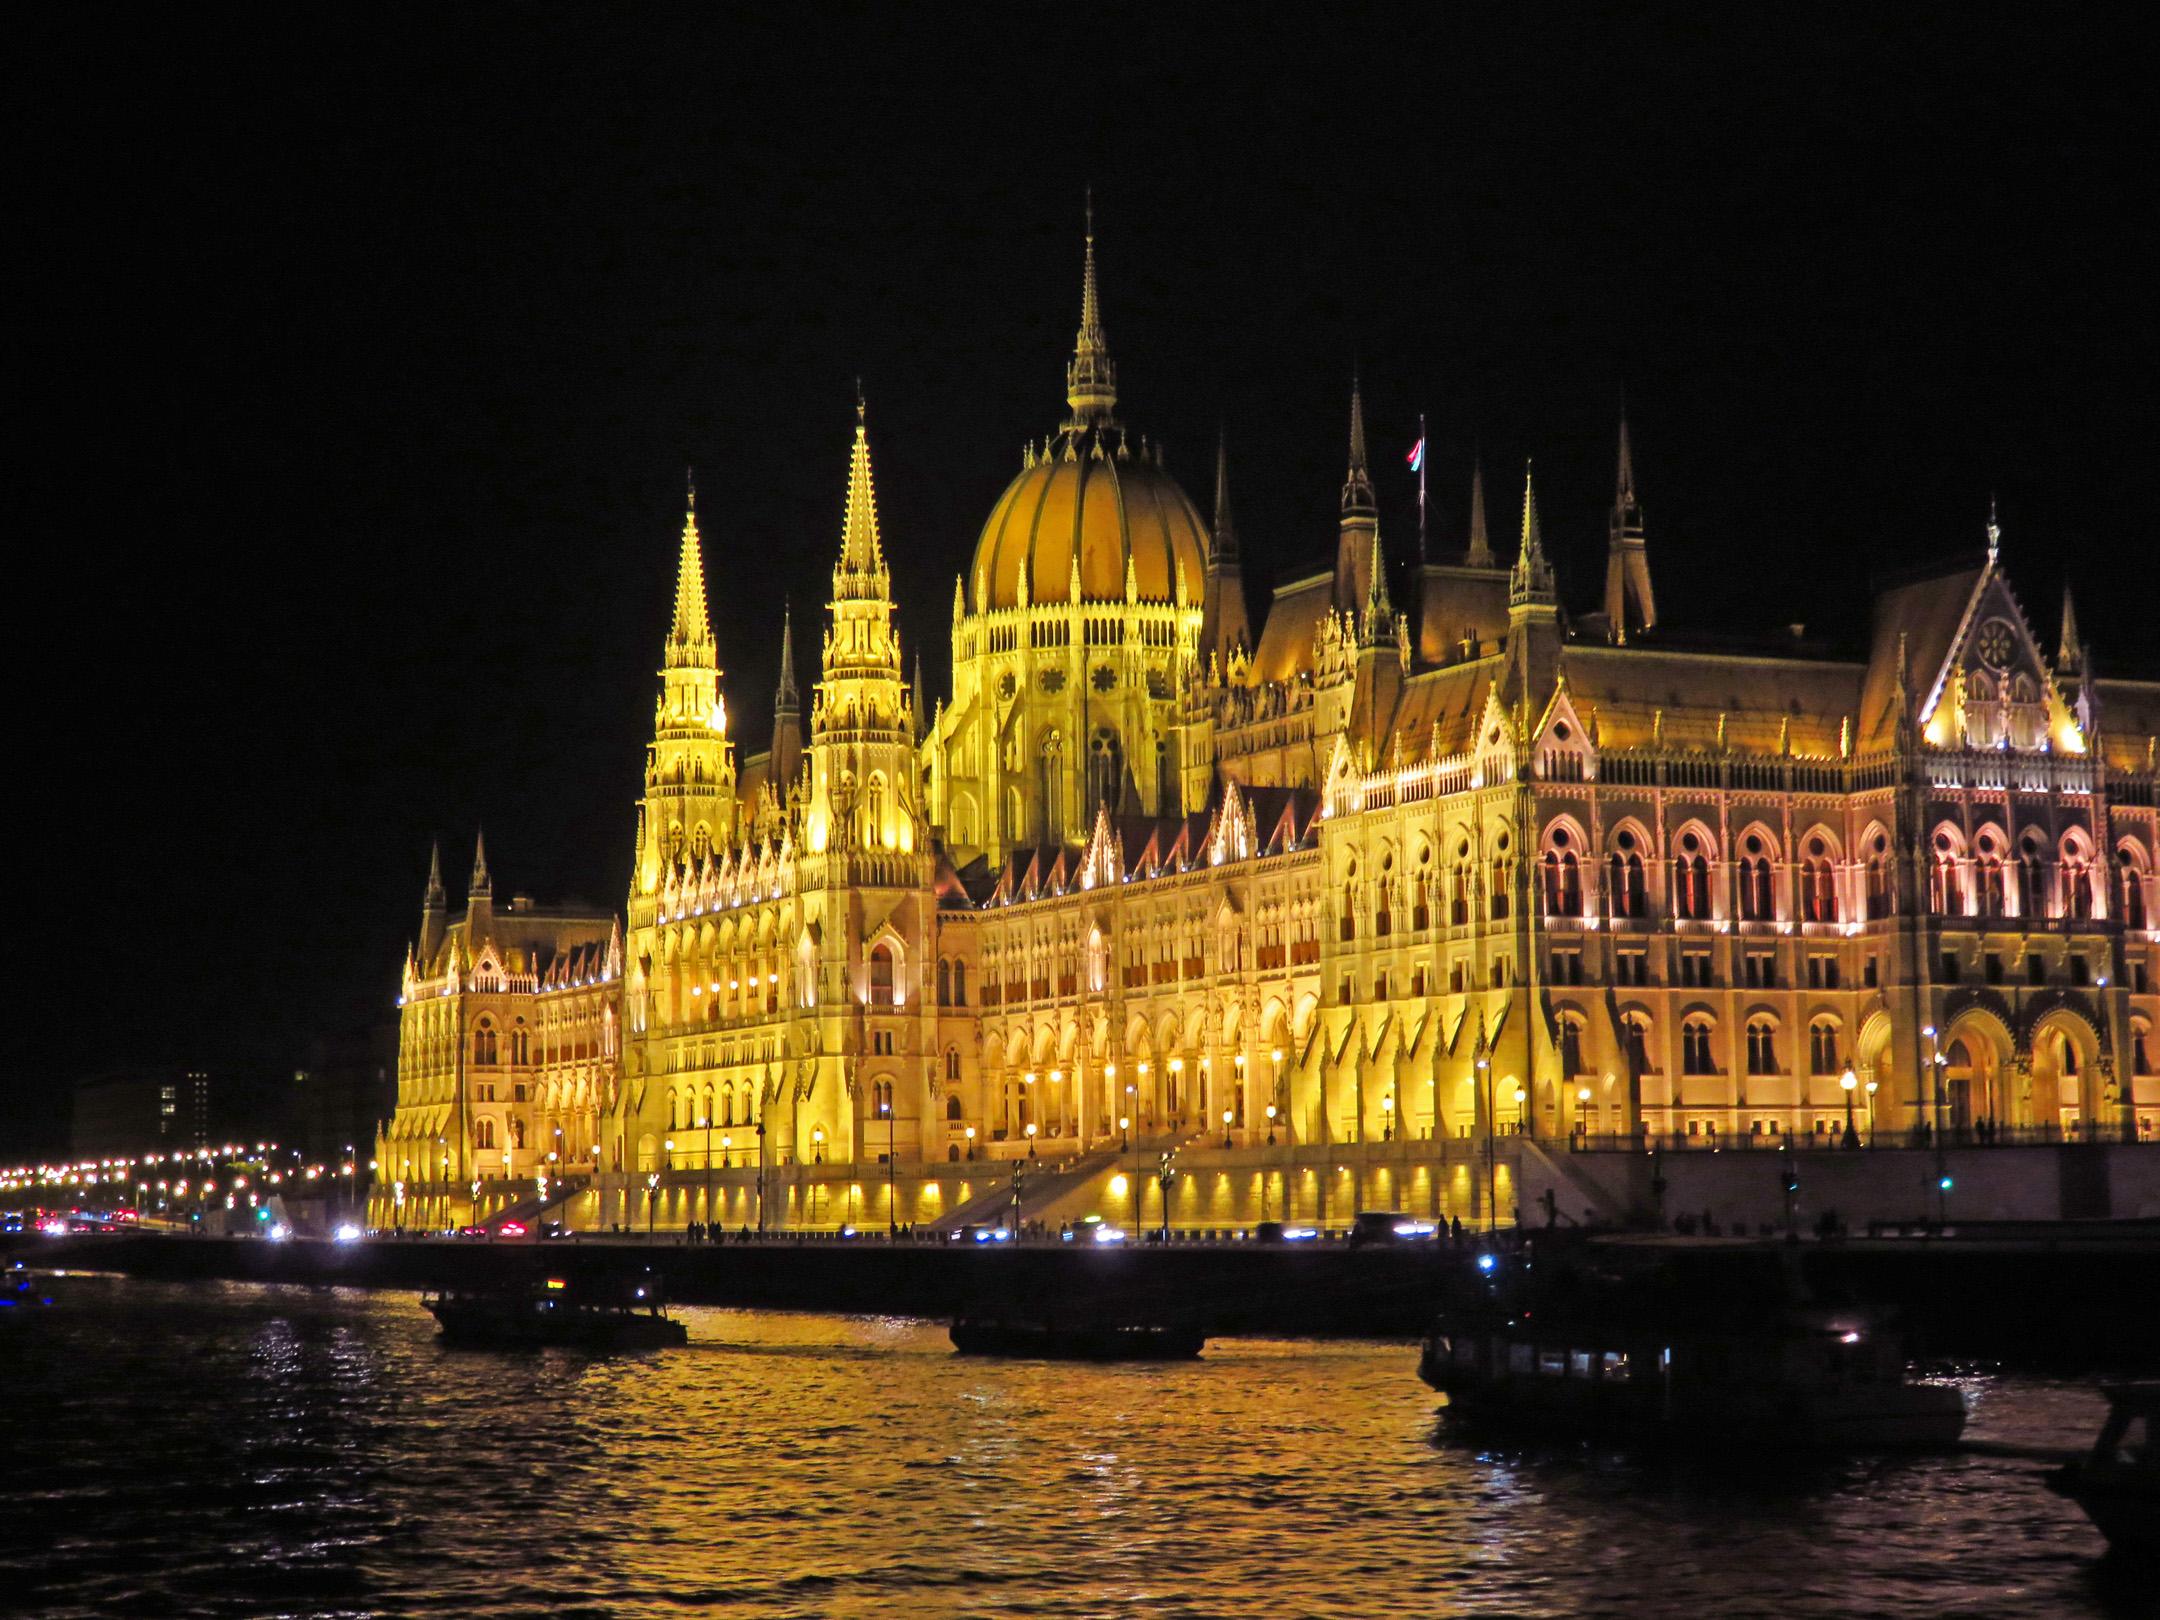 3. Budapest Parliament at night